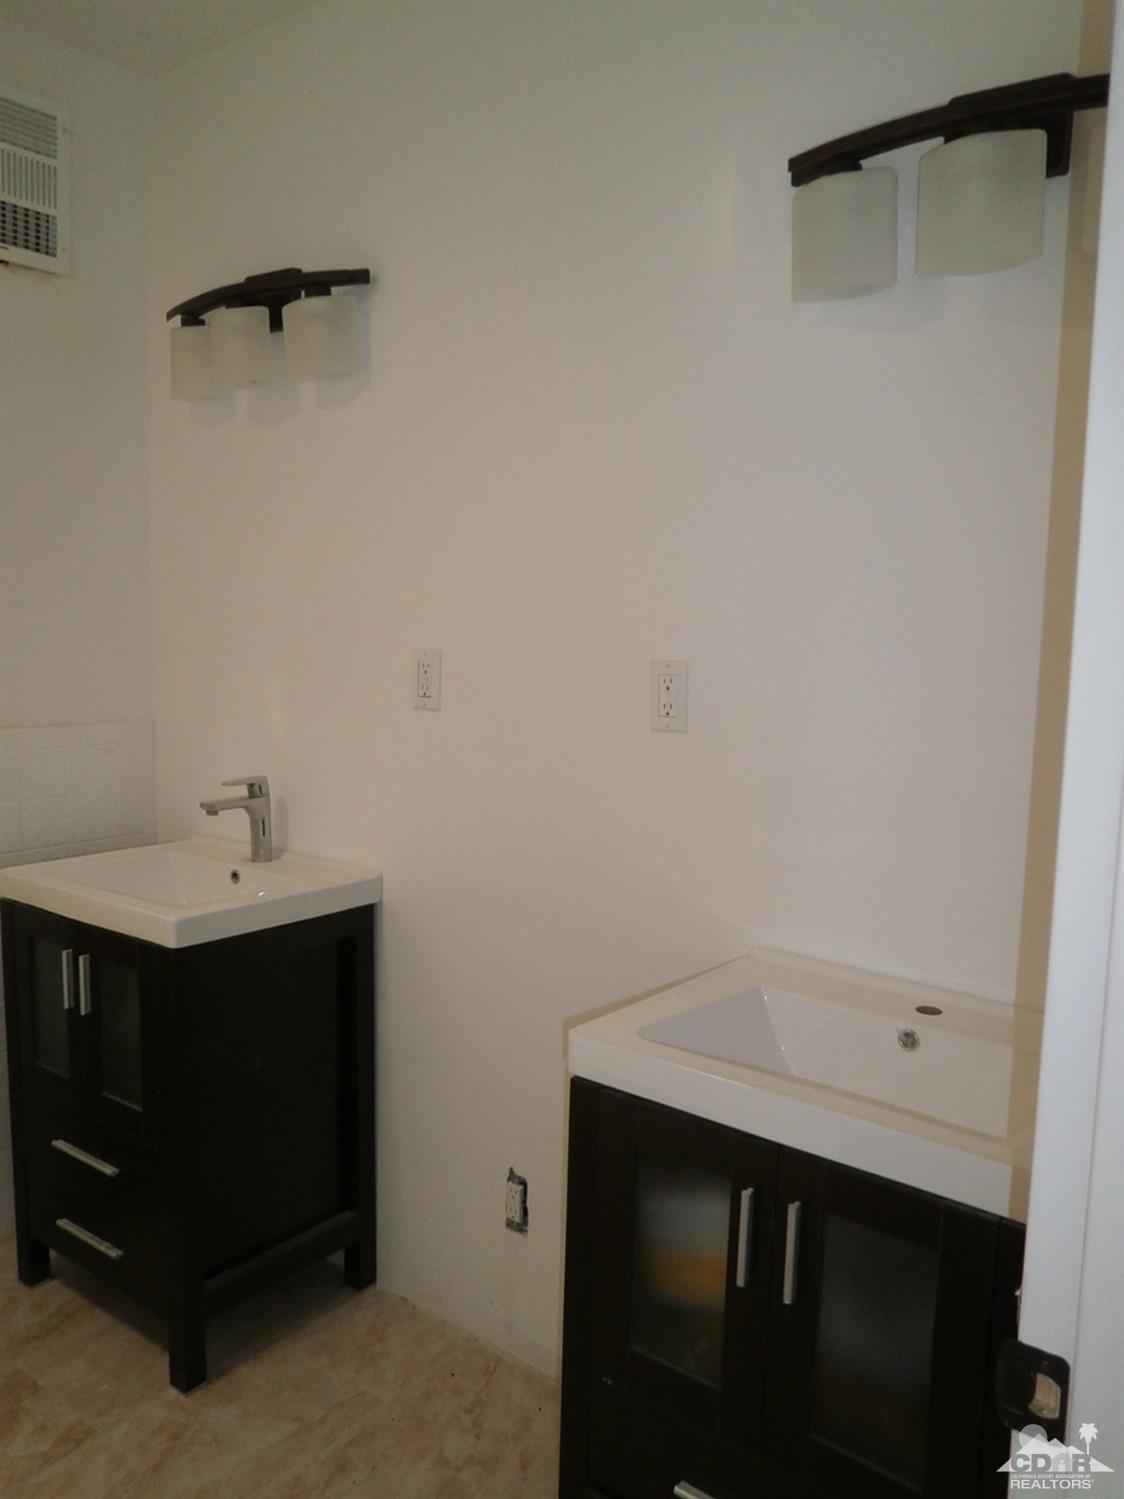 4373 E Camino Parocela, Palm Springs, California 92264, 3 Bedrooms Bedrooms, ,2 BathroomsBathrooms,Residential,Sold,4373 E Camino Parocela,218025844